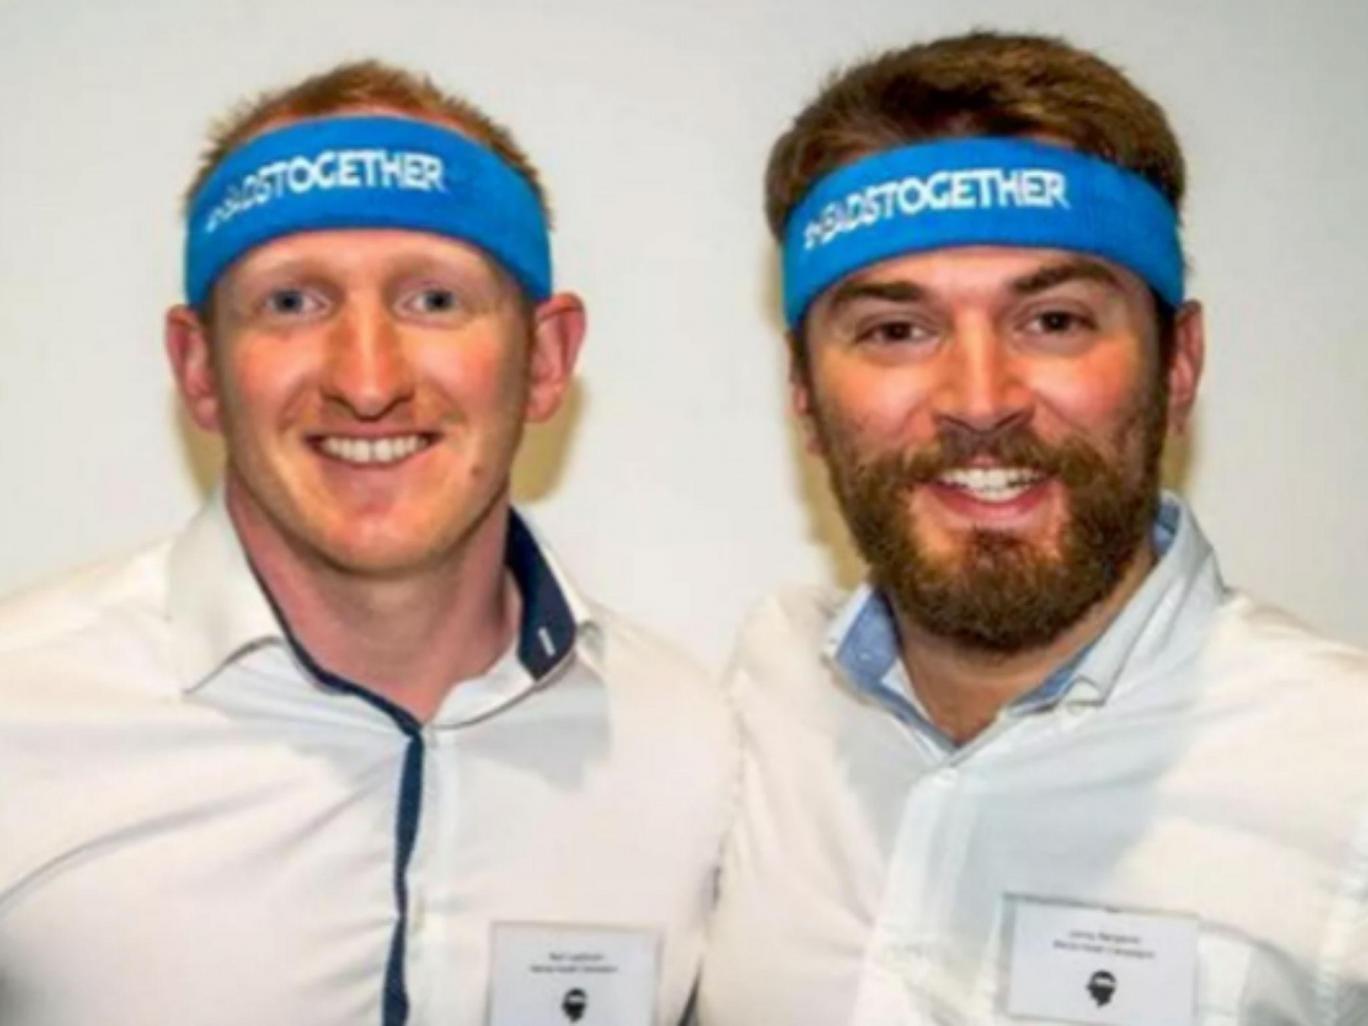 Man Runs London Marathon Alongside Stranger Who Saved His Life